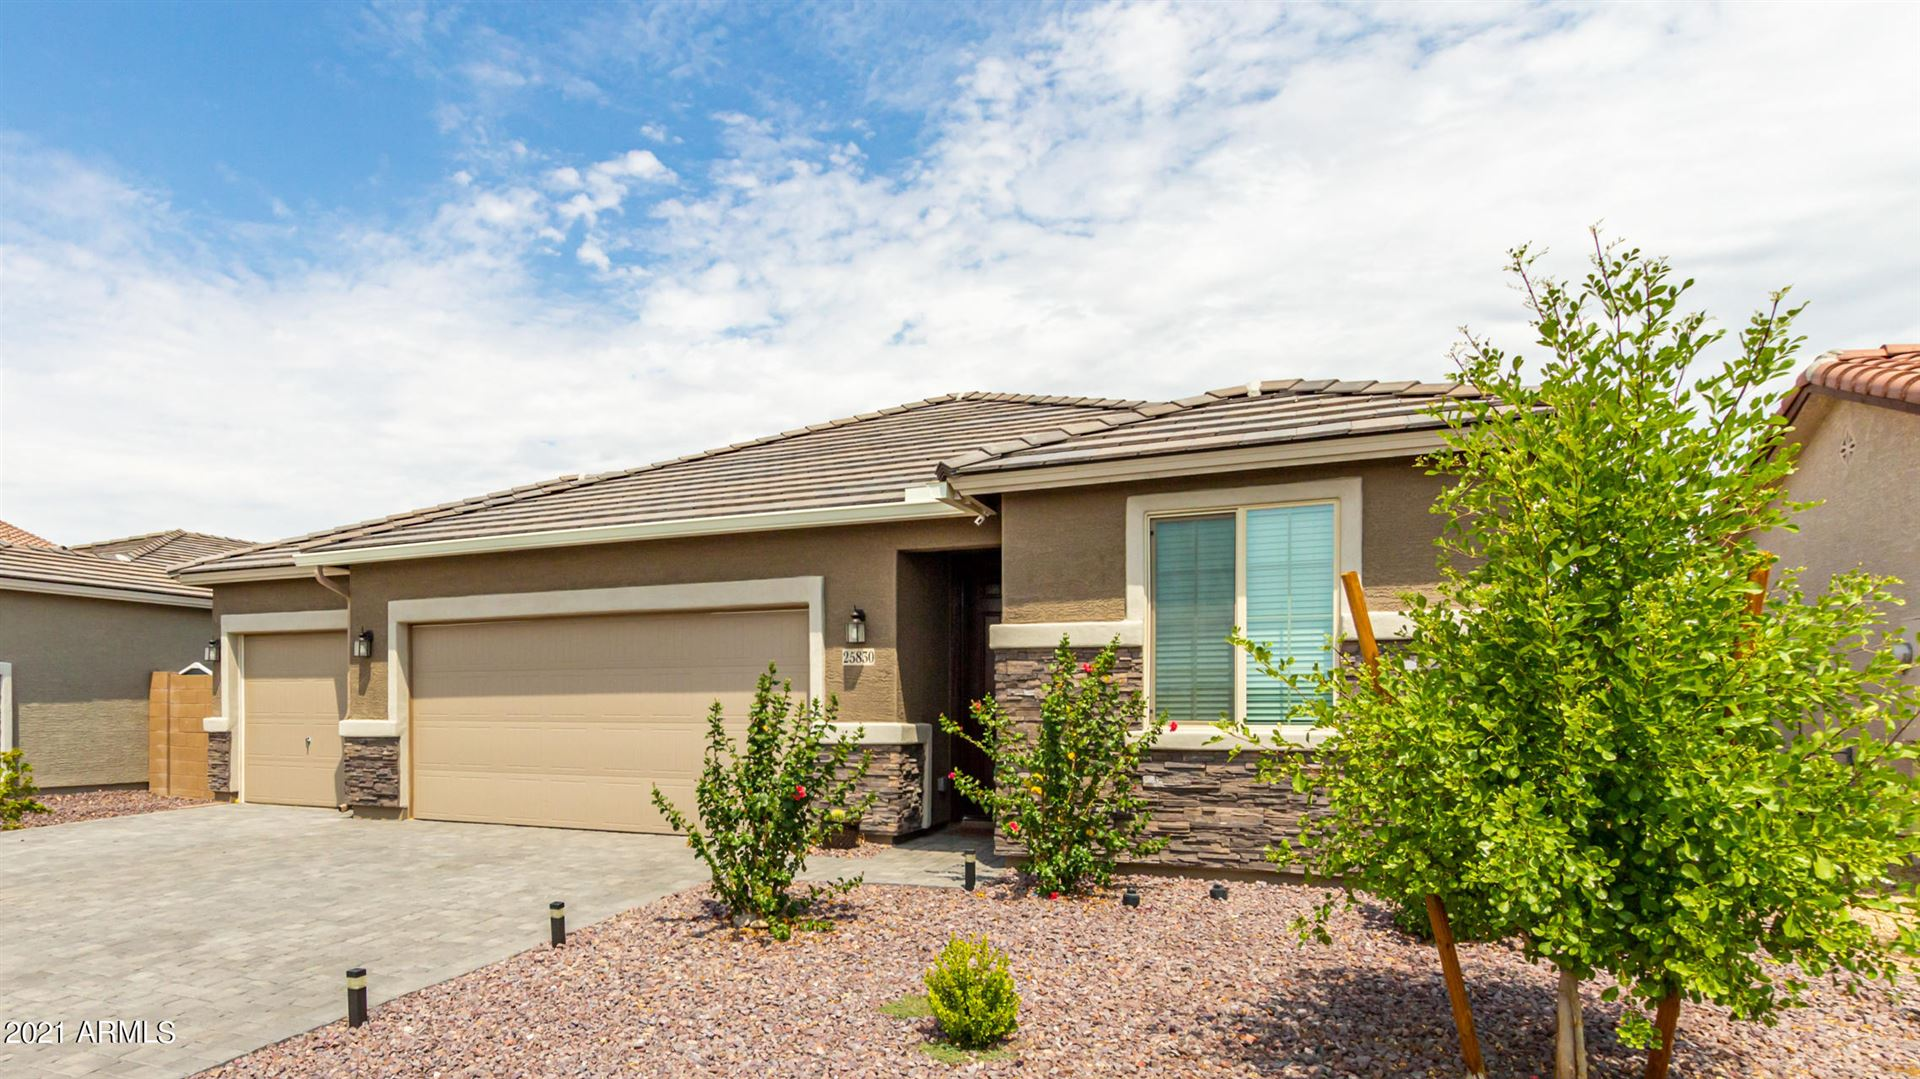 25830 N Halter Drive, Peoria, AZ 85383 - MLS#: 6263085